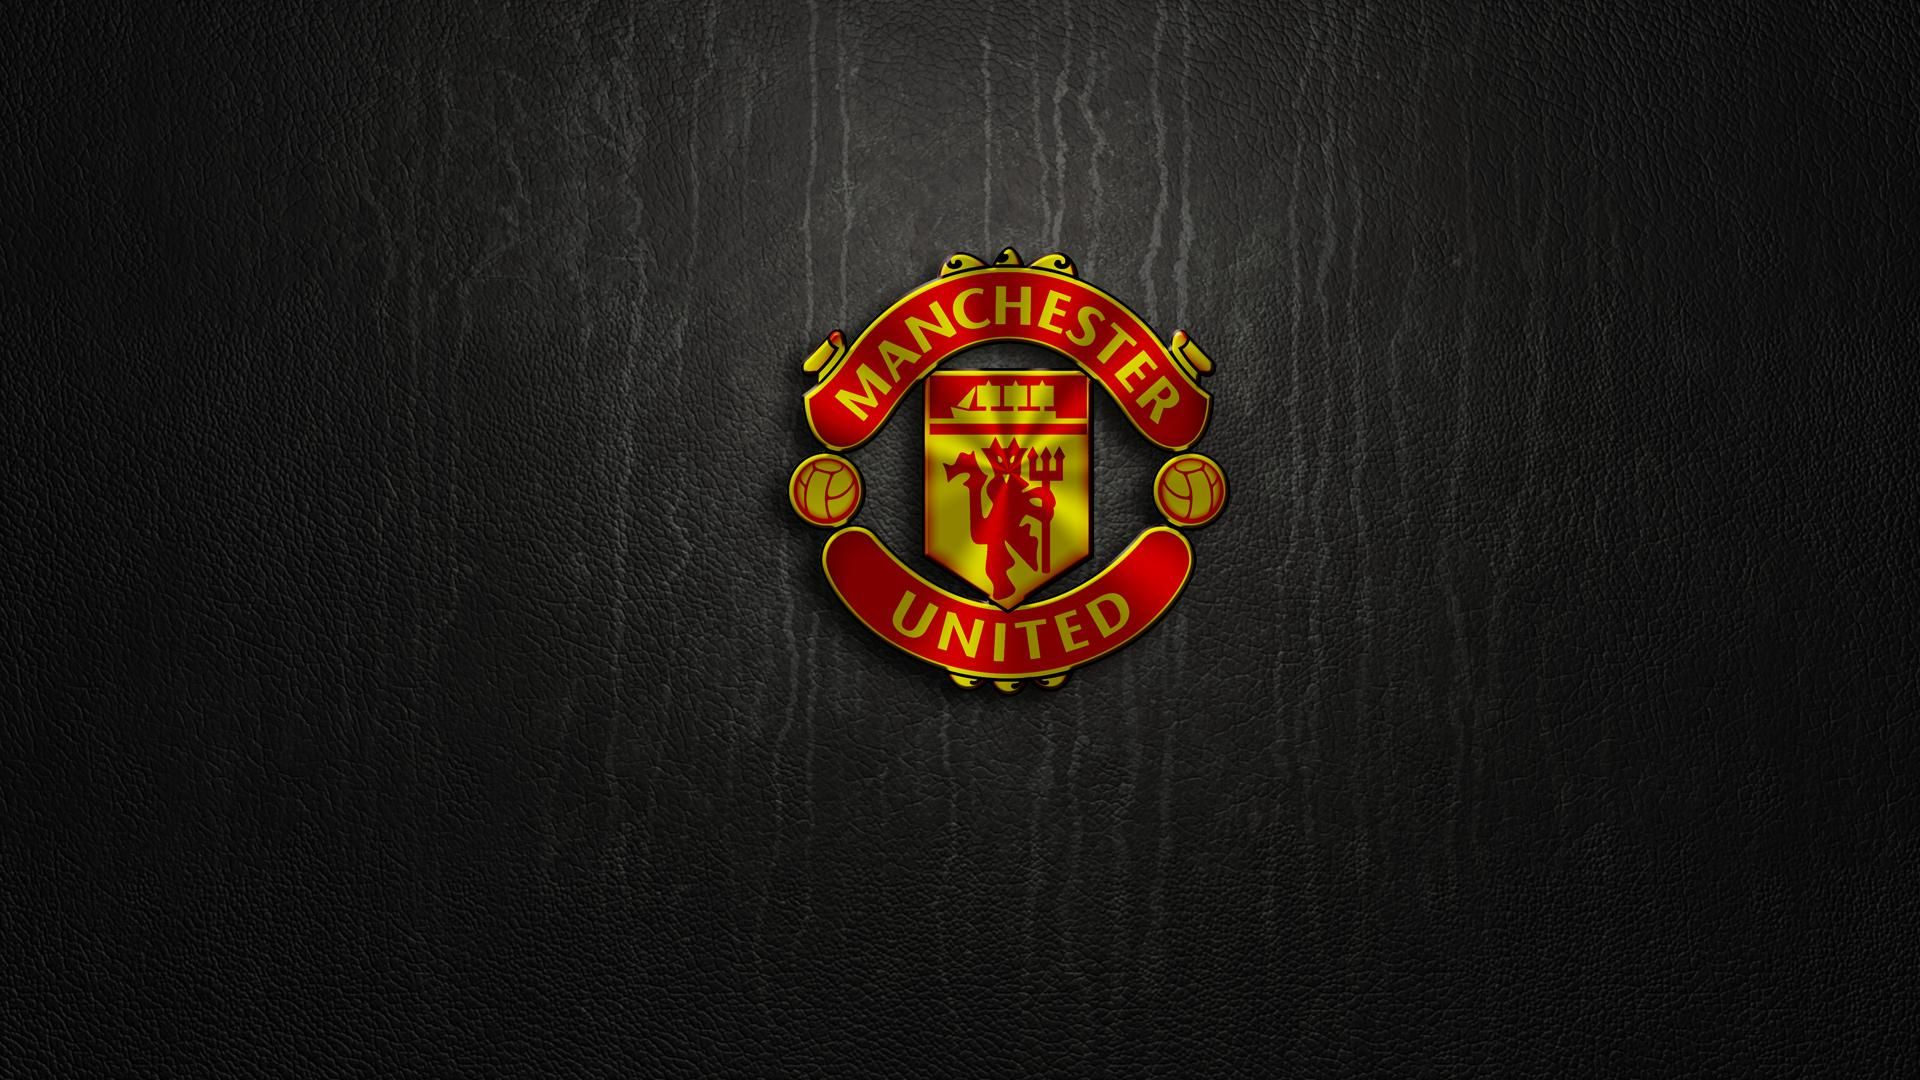 Wallpaper Manchester Logo By Ms Muriel Rodriguezhjjj Manchester United Wallpaper Manchester United Logo Manchester Logo